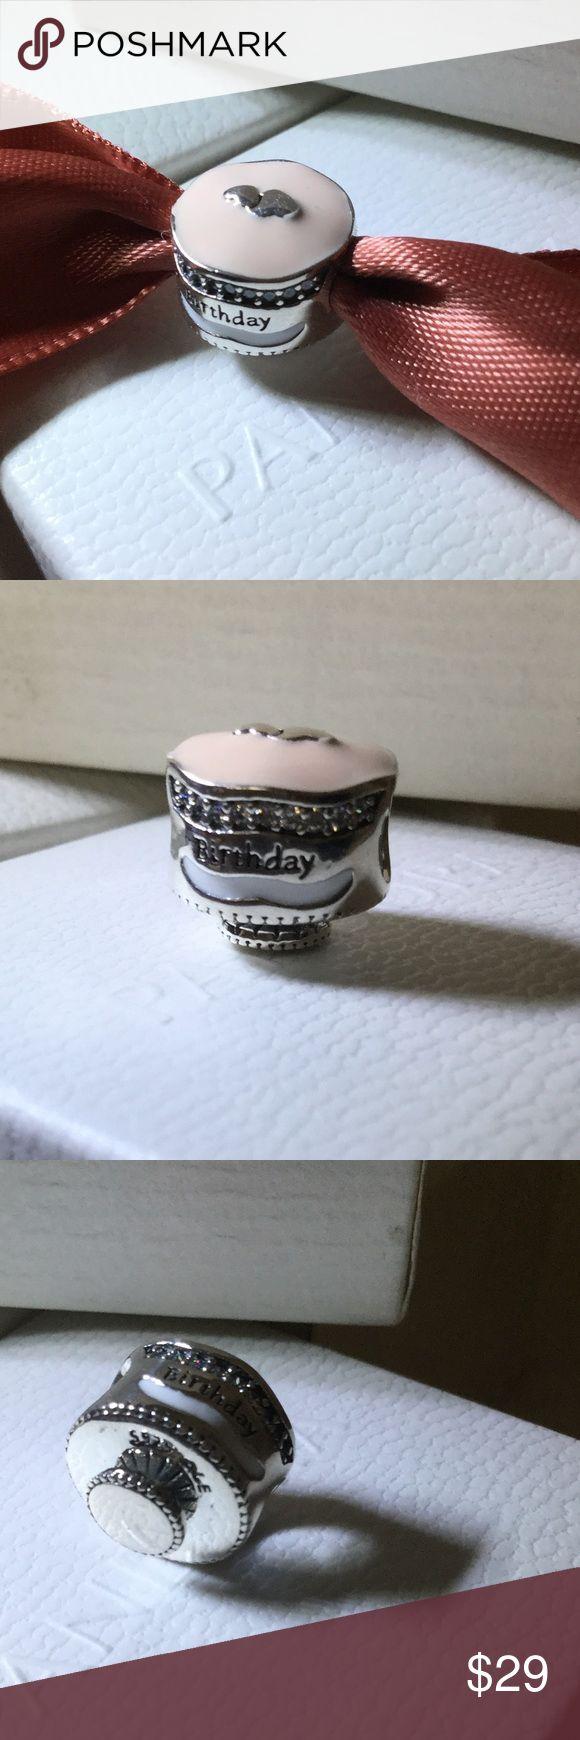 Pandora birthday cake charm ale s 925 Brand new Pandora birthday cake charm ale s925 Pandora Jewelry Bracelets